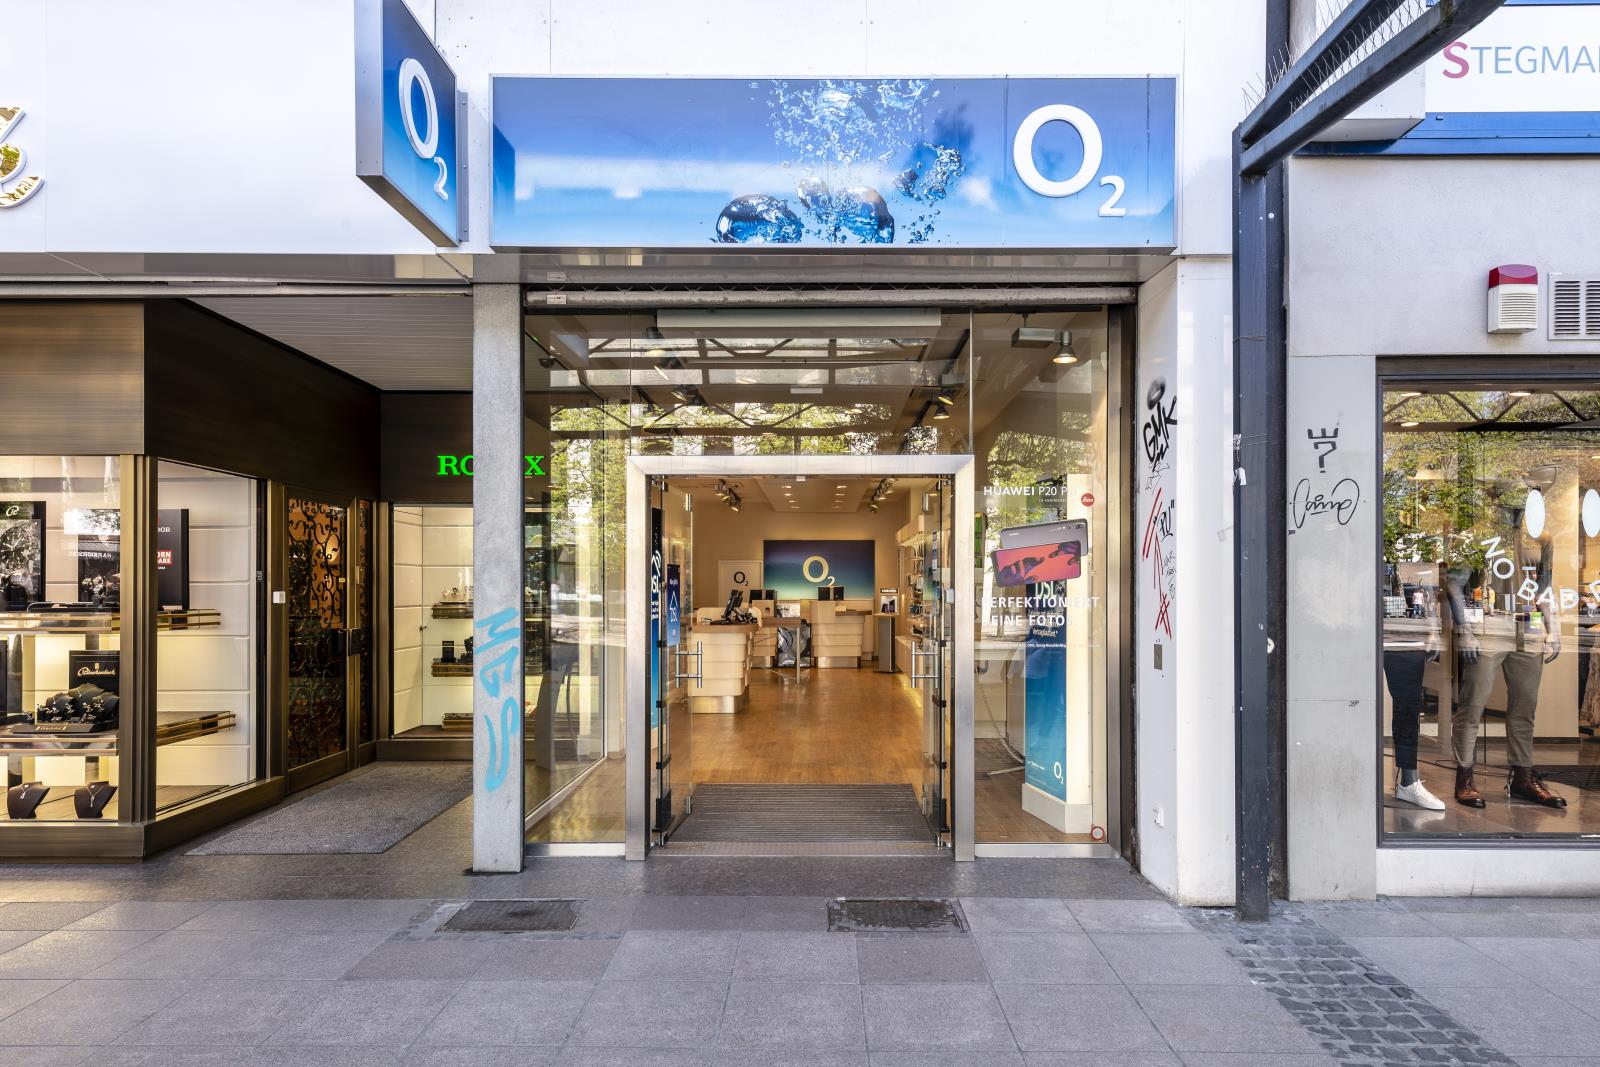 o2 Shop, Königstraße 6 in Duisburg